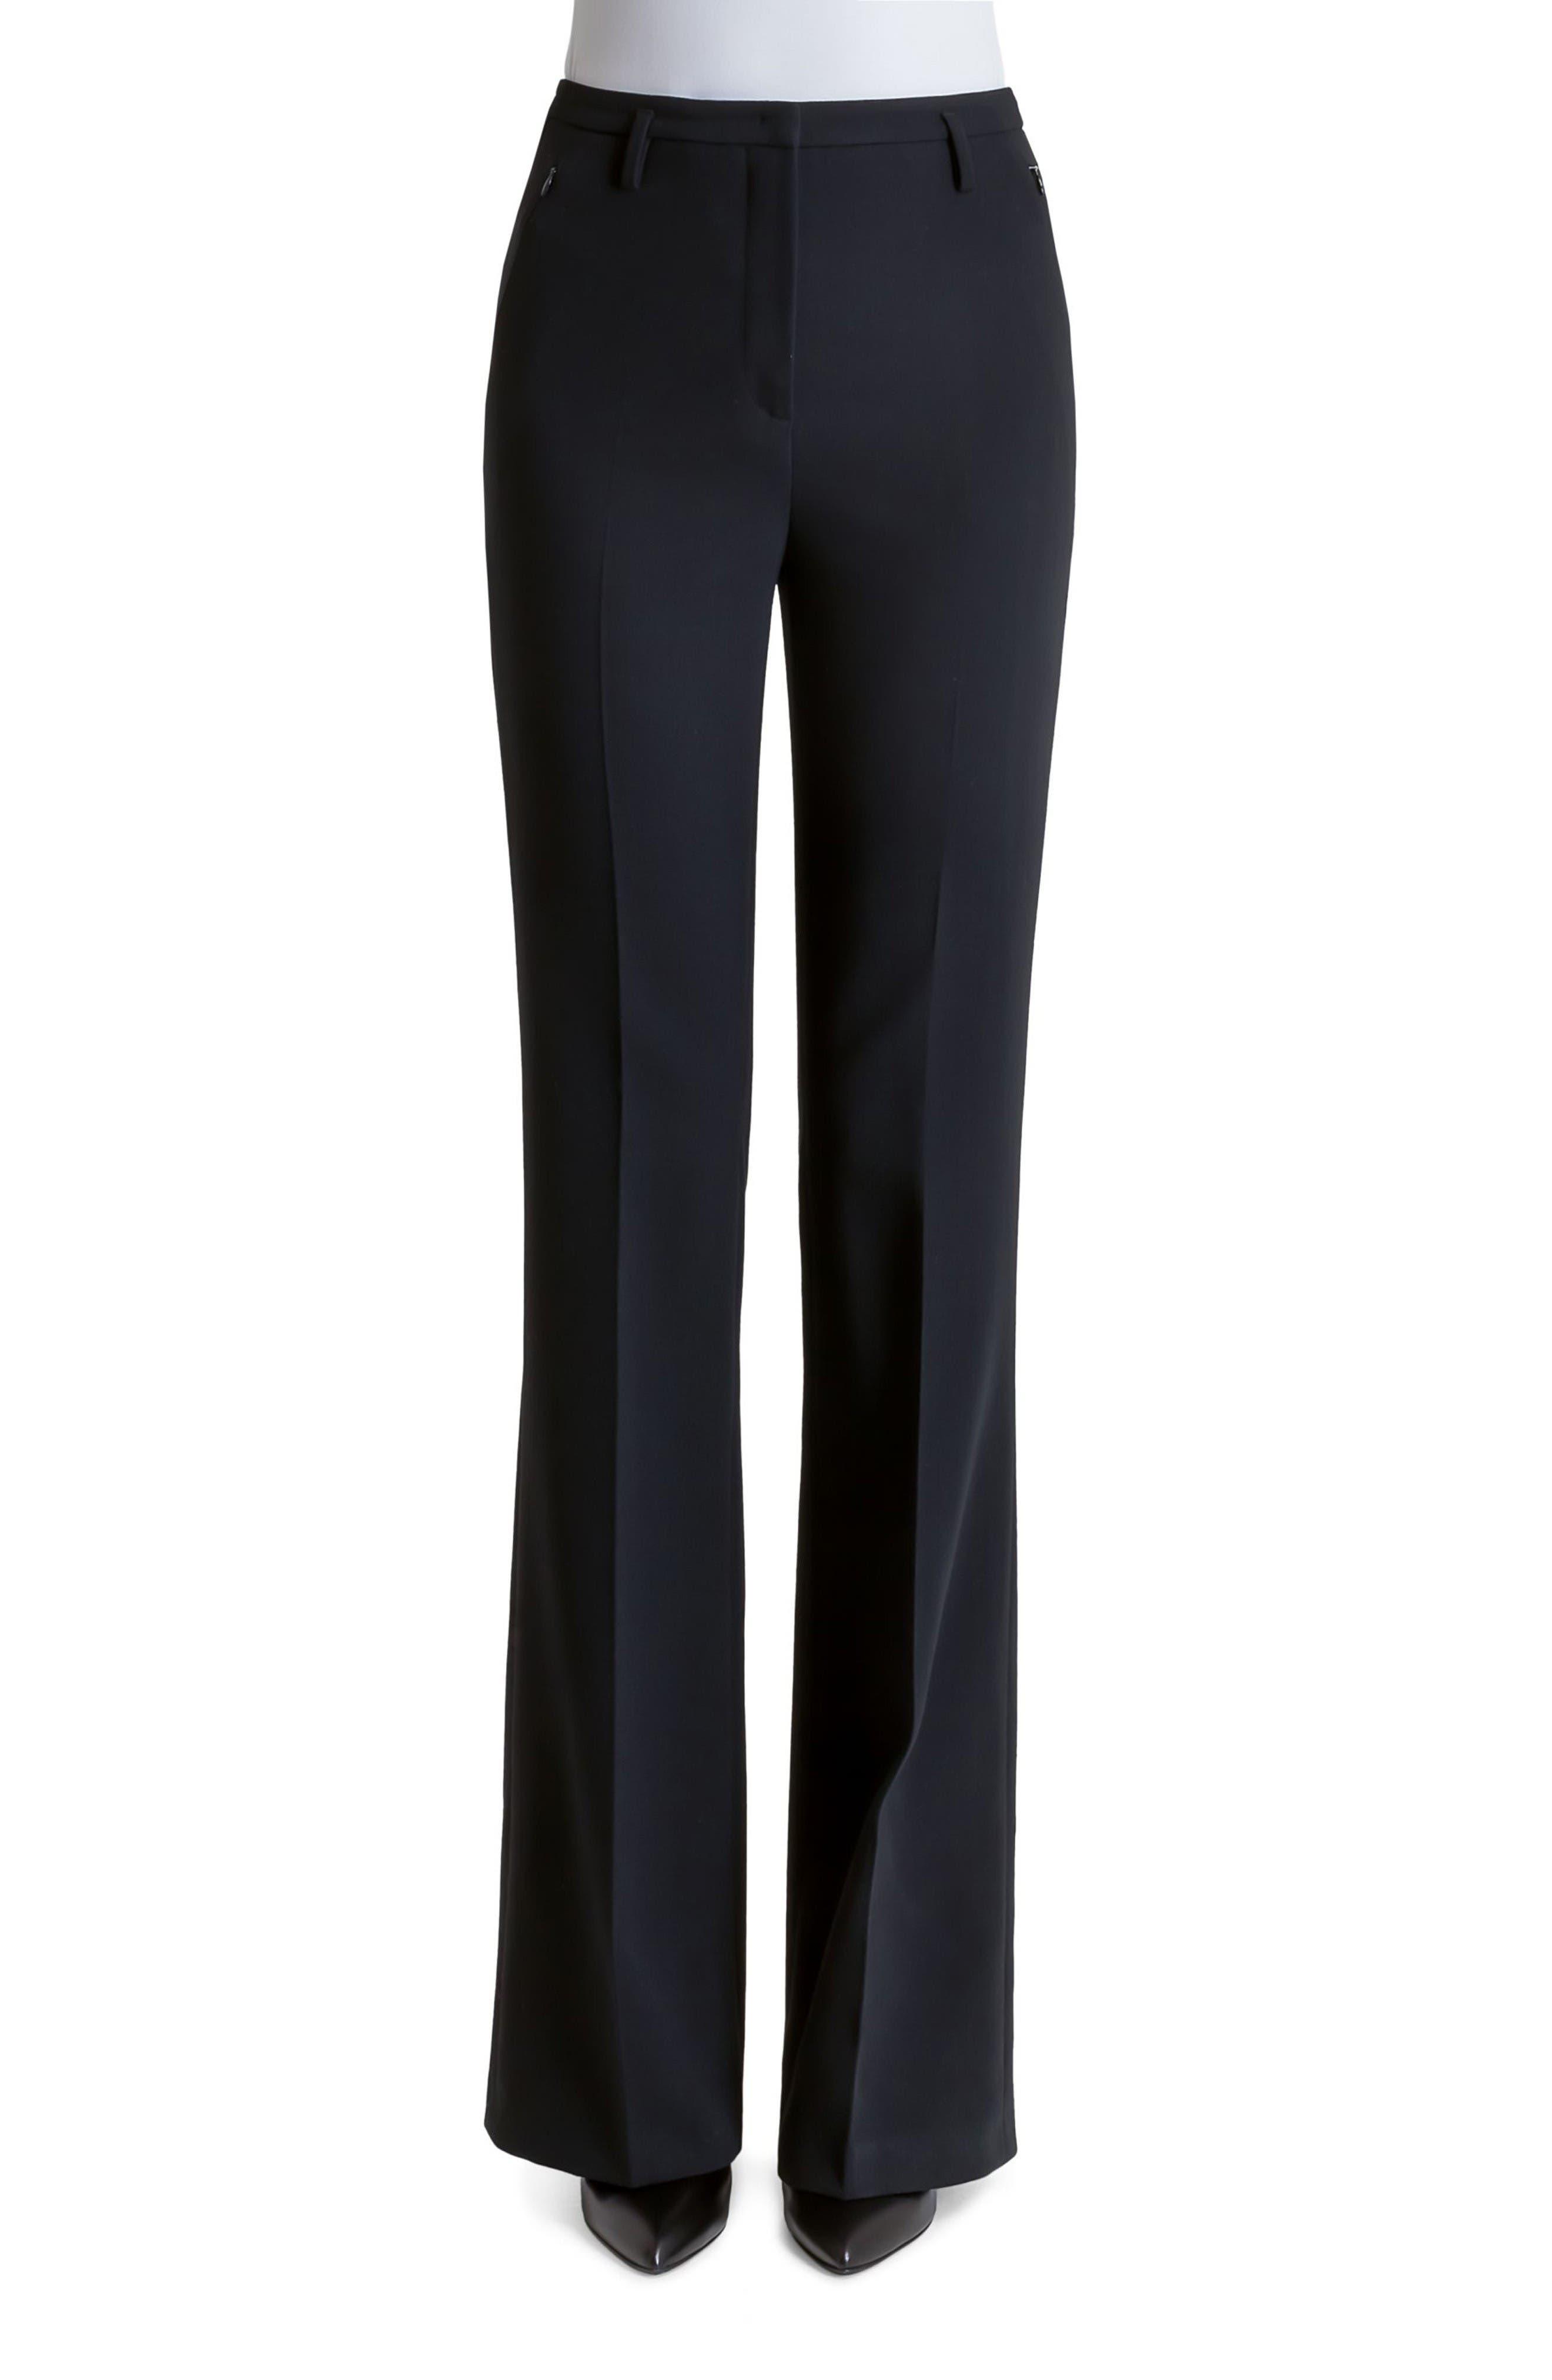 Alternate Image 1 Selected - Akris Farrah Stretch Wool Flare Pants